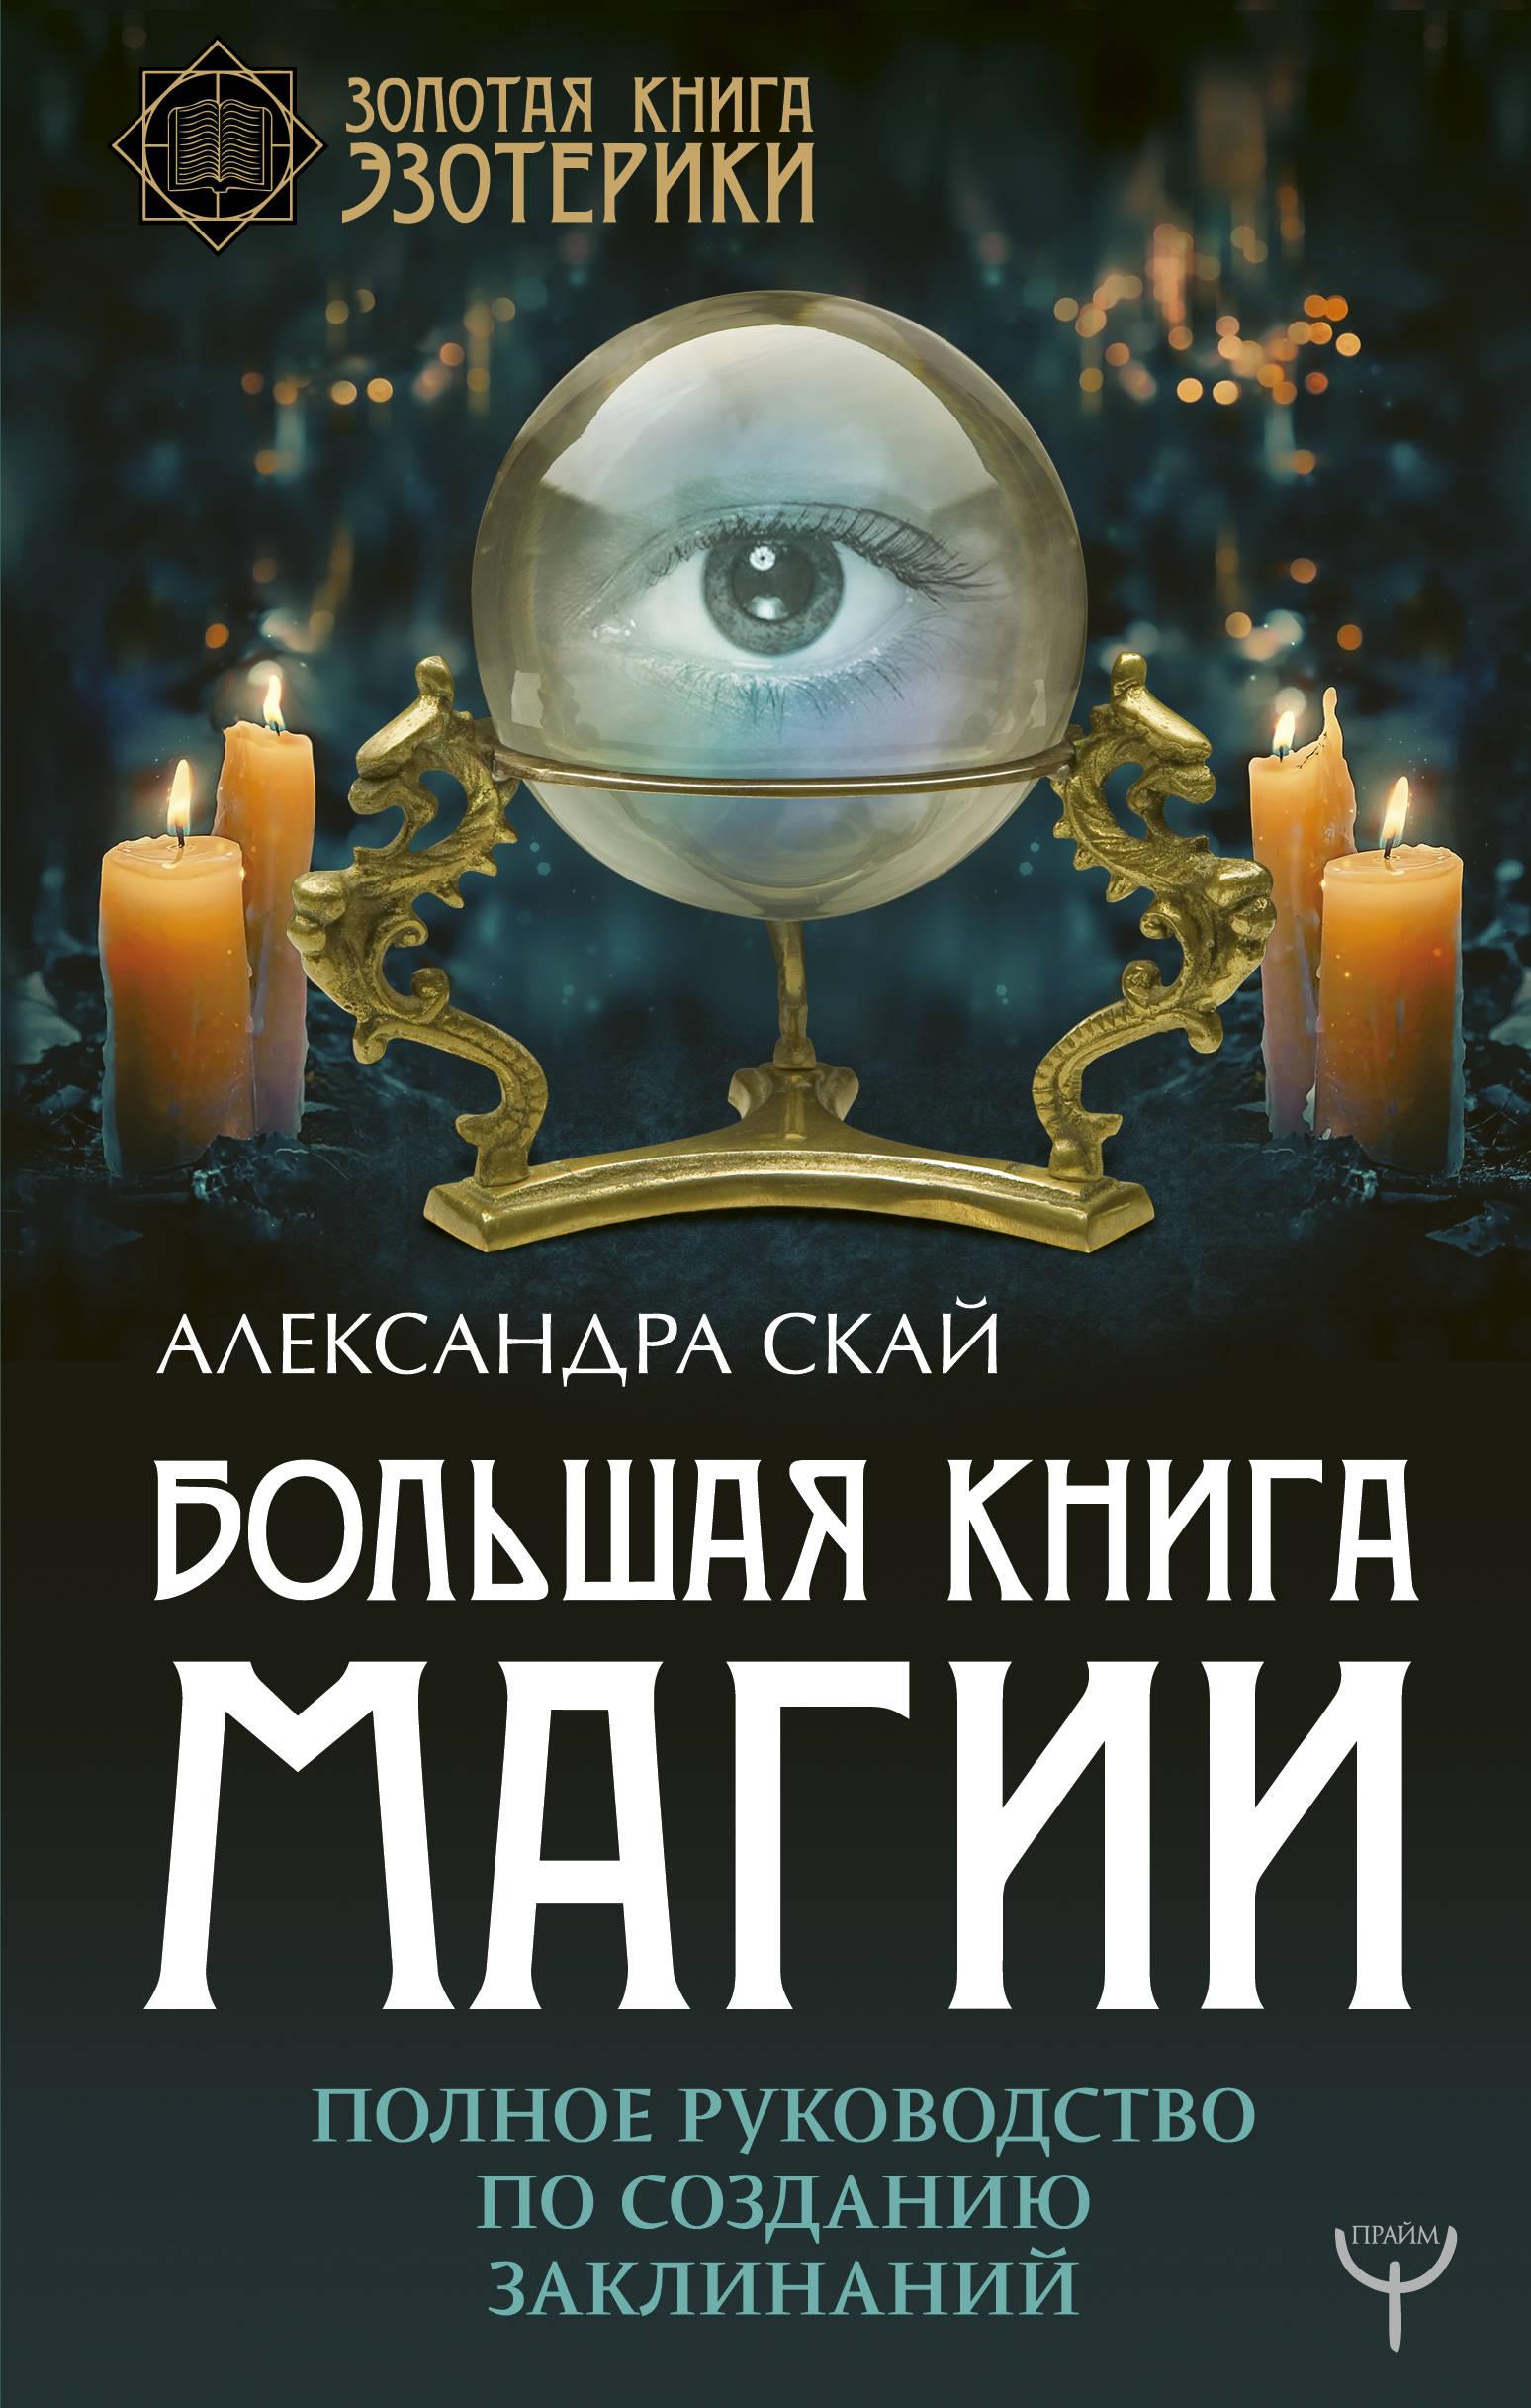 Bolshaja kniga magii. Polnoe rukovodstvo po sozdaniju zaklinanij